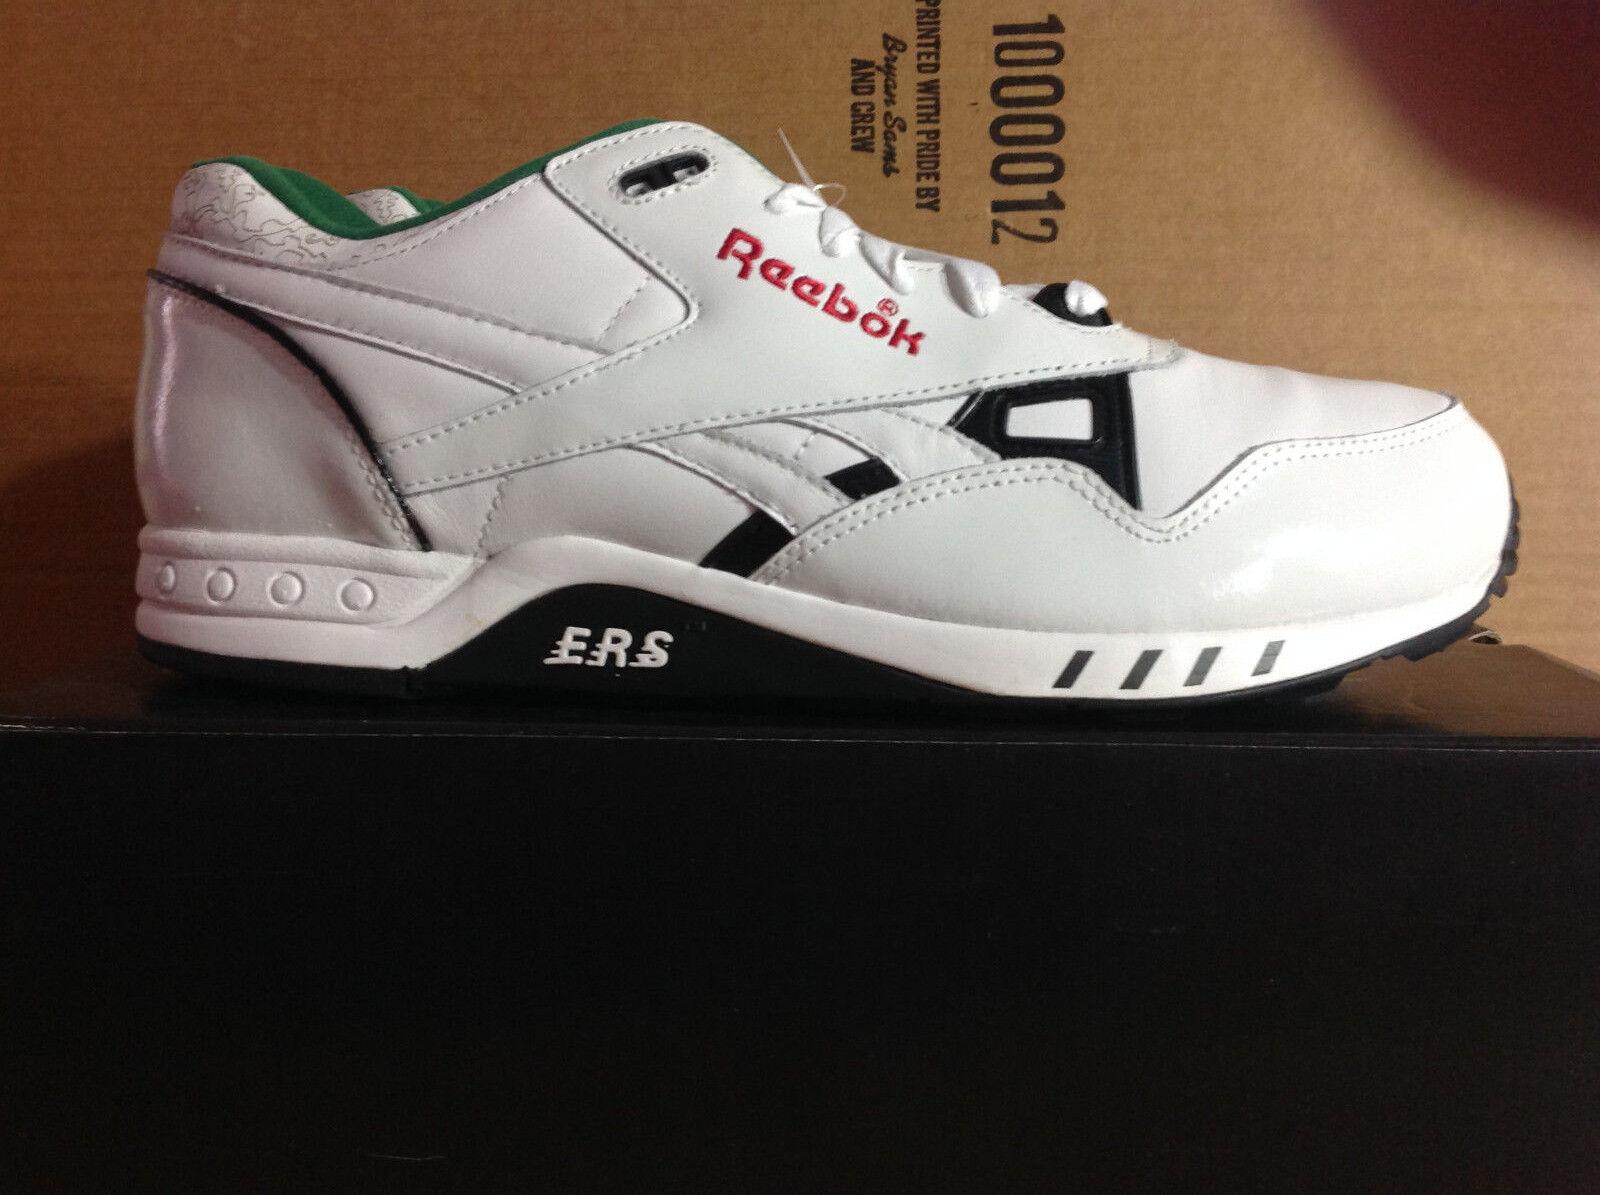 REEBOK ERS 2000-RFC stylemen's size US10-VERY RARE-3600 PAIRS MADE